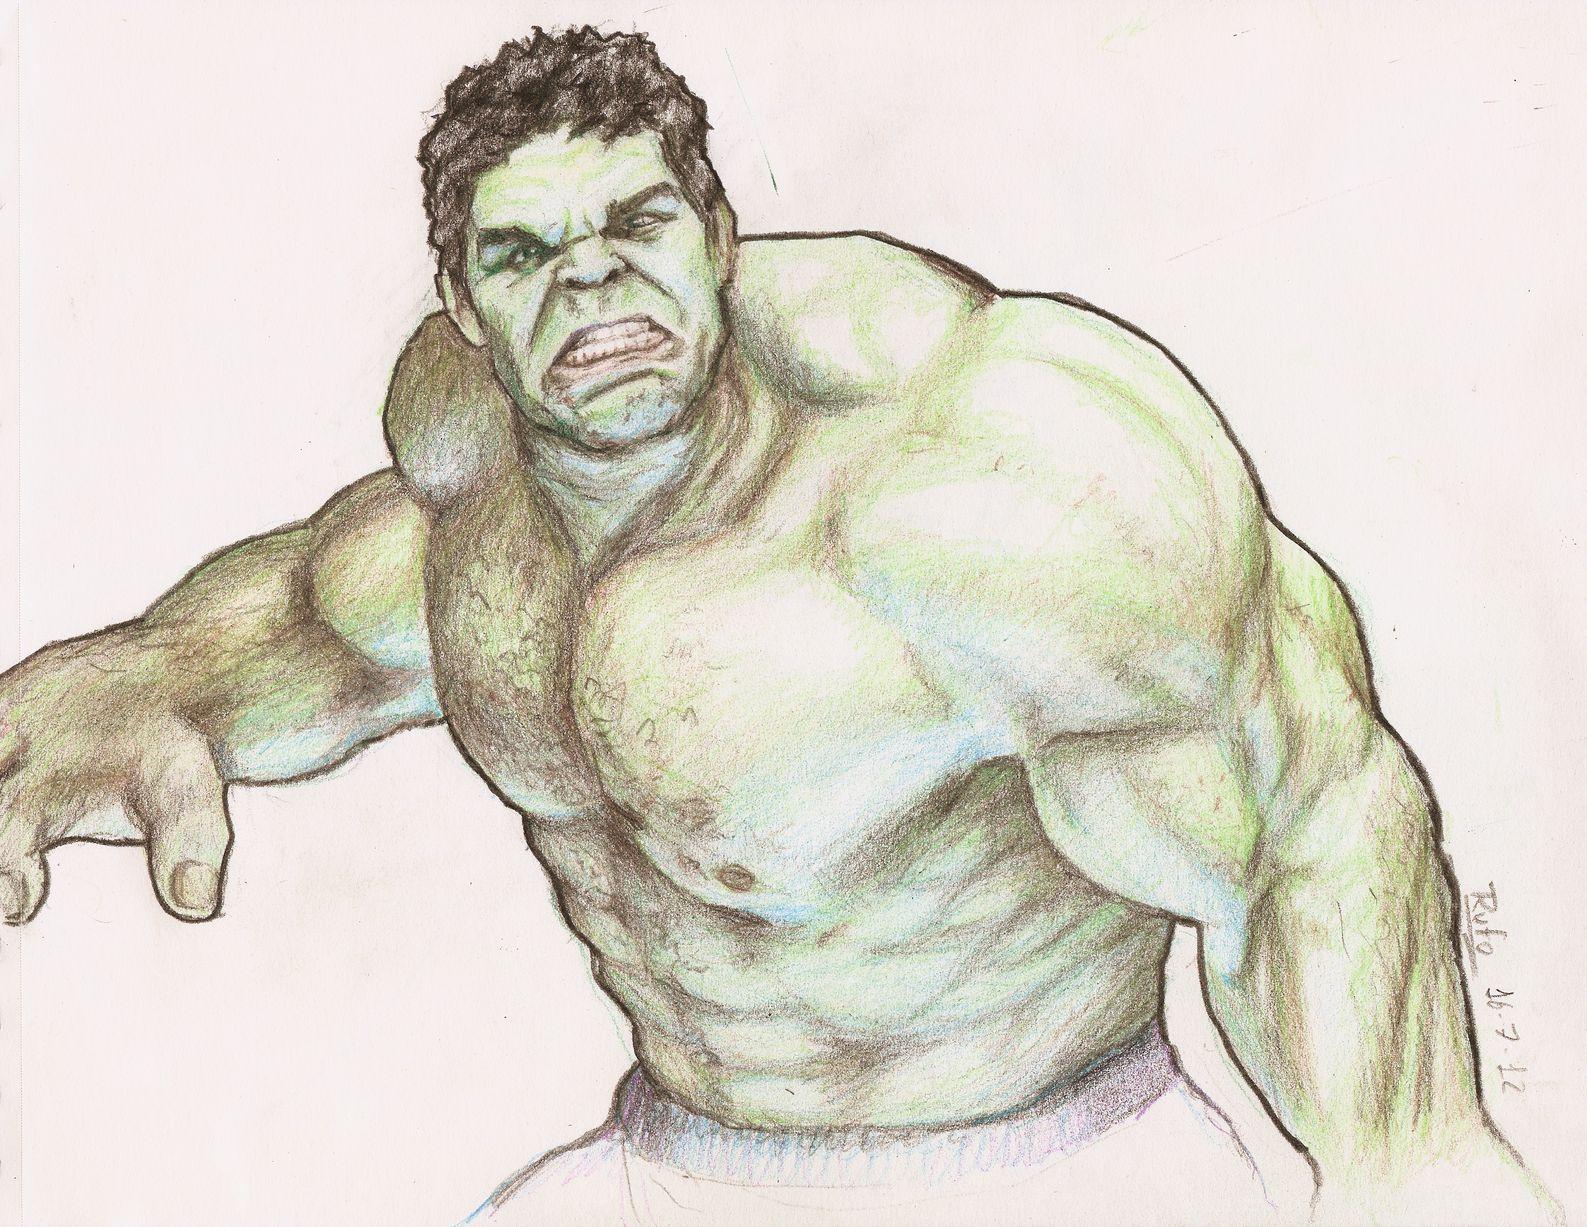 Hulk Para Colorear Facil: Hulk En Dibujo A Lápiz